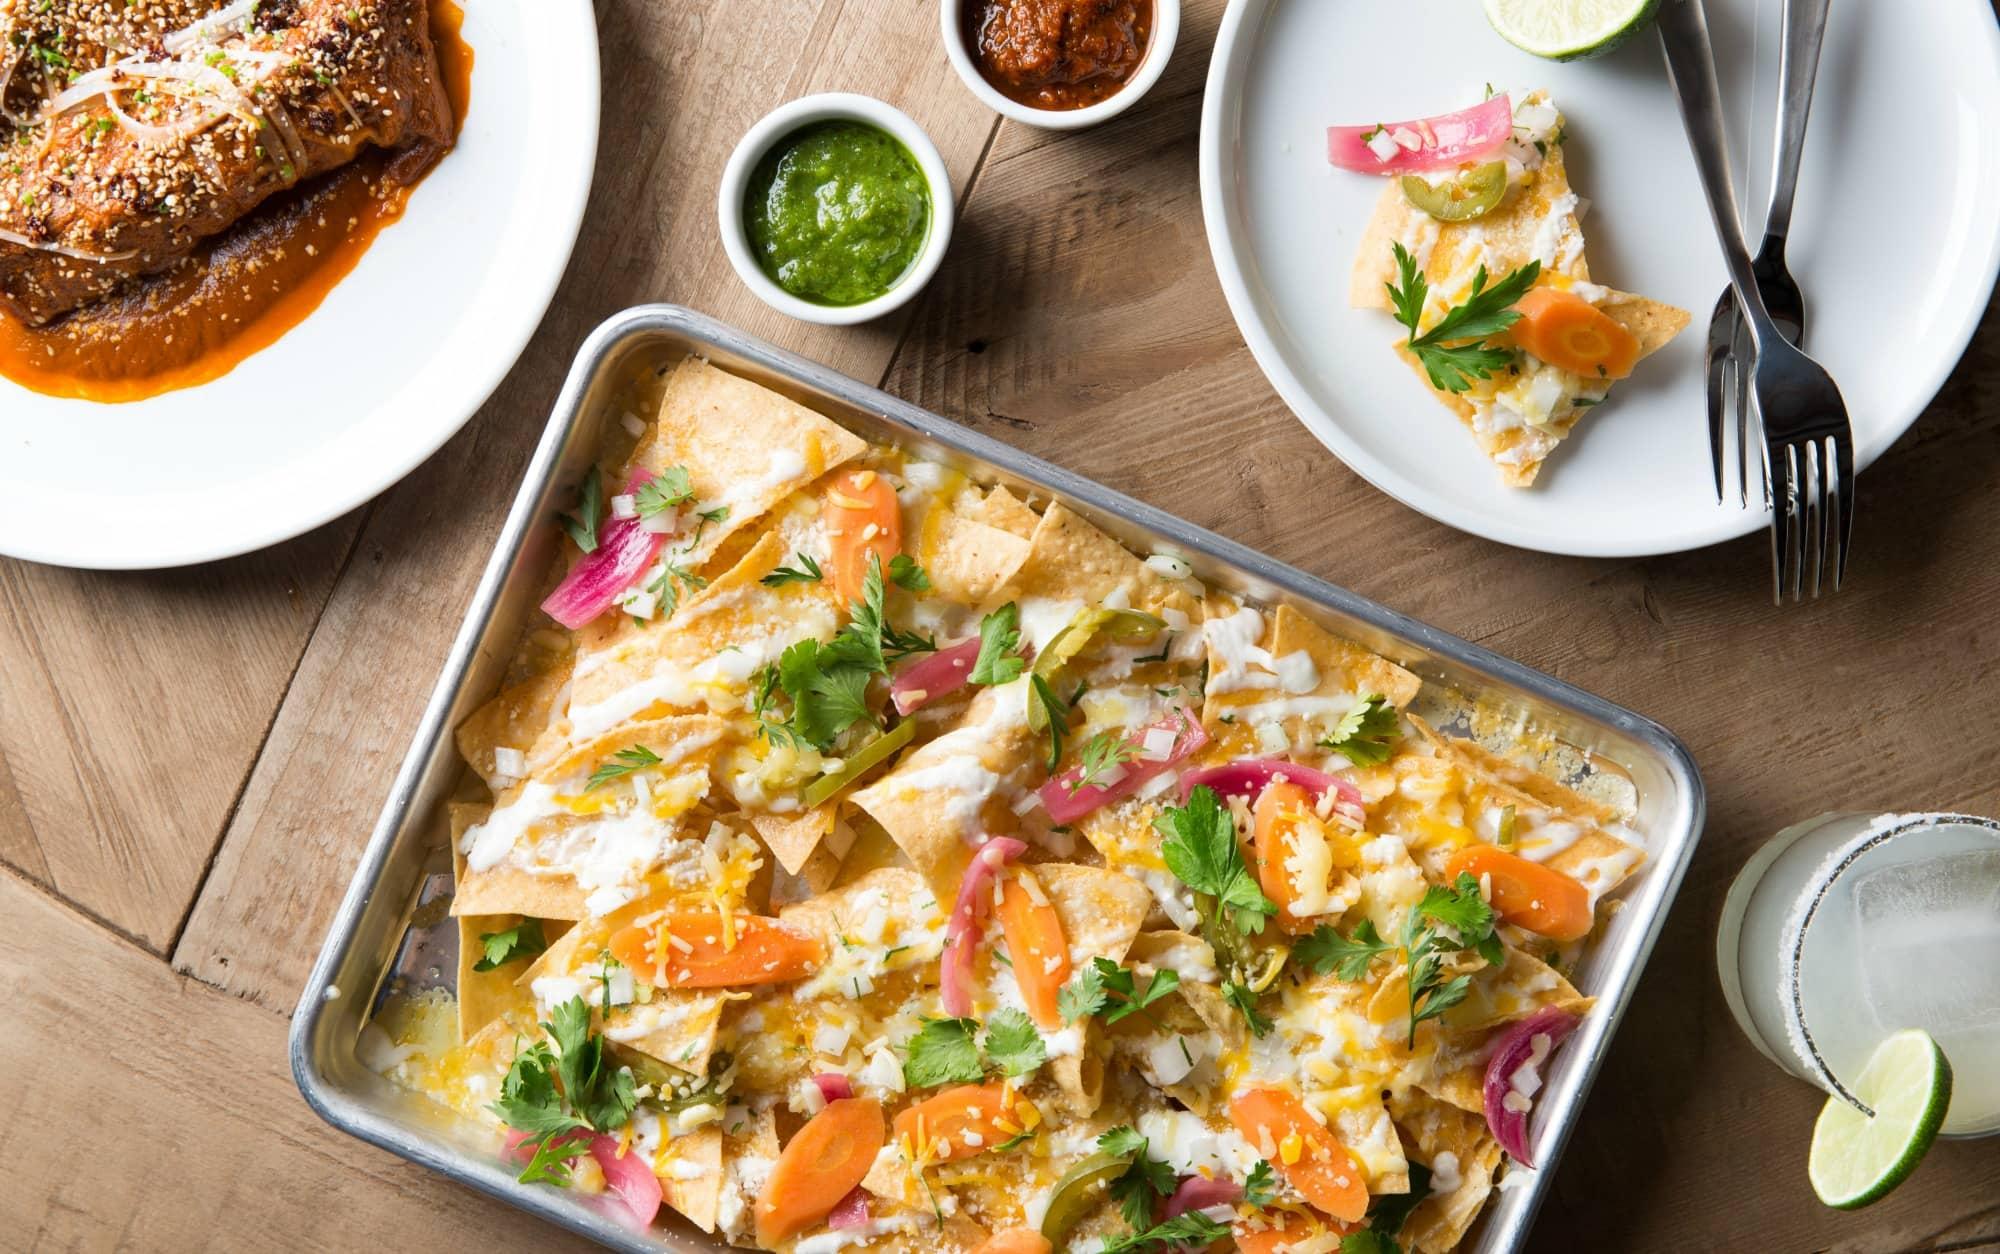 Tallula's_Turkey Enchiladas & Nachos Sencillo_Photo Credit Rick Poon